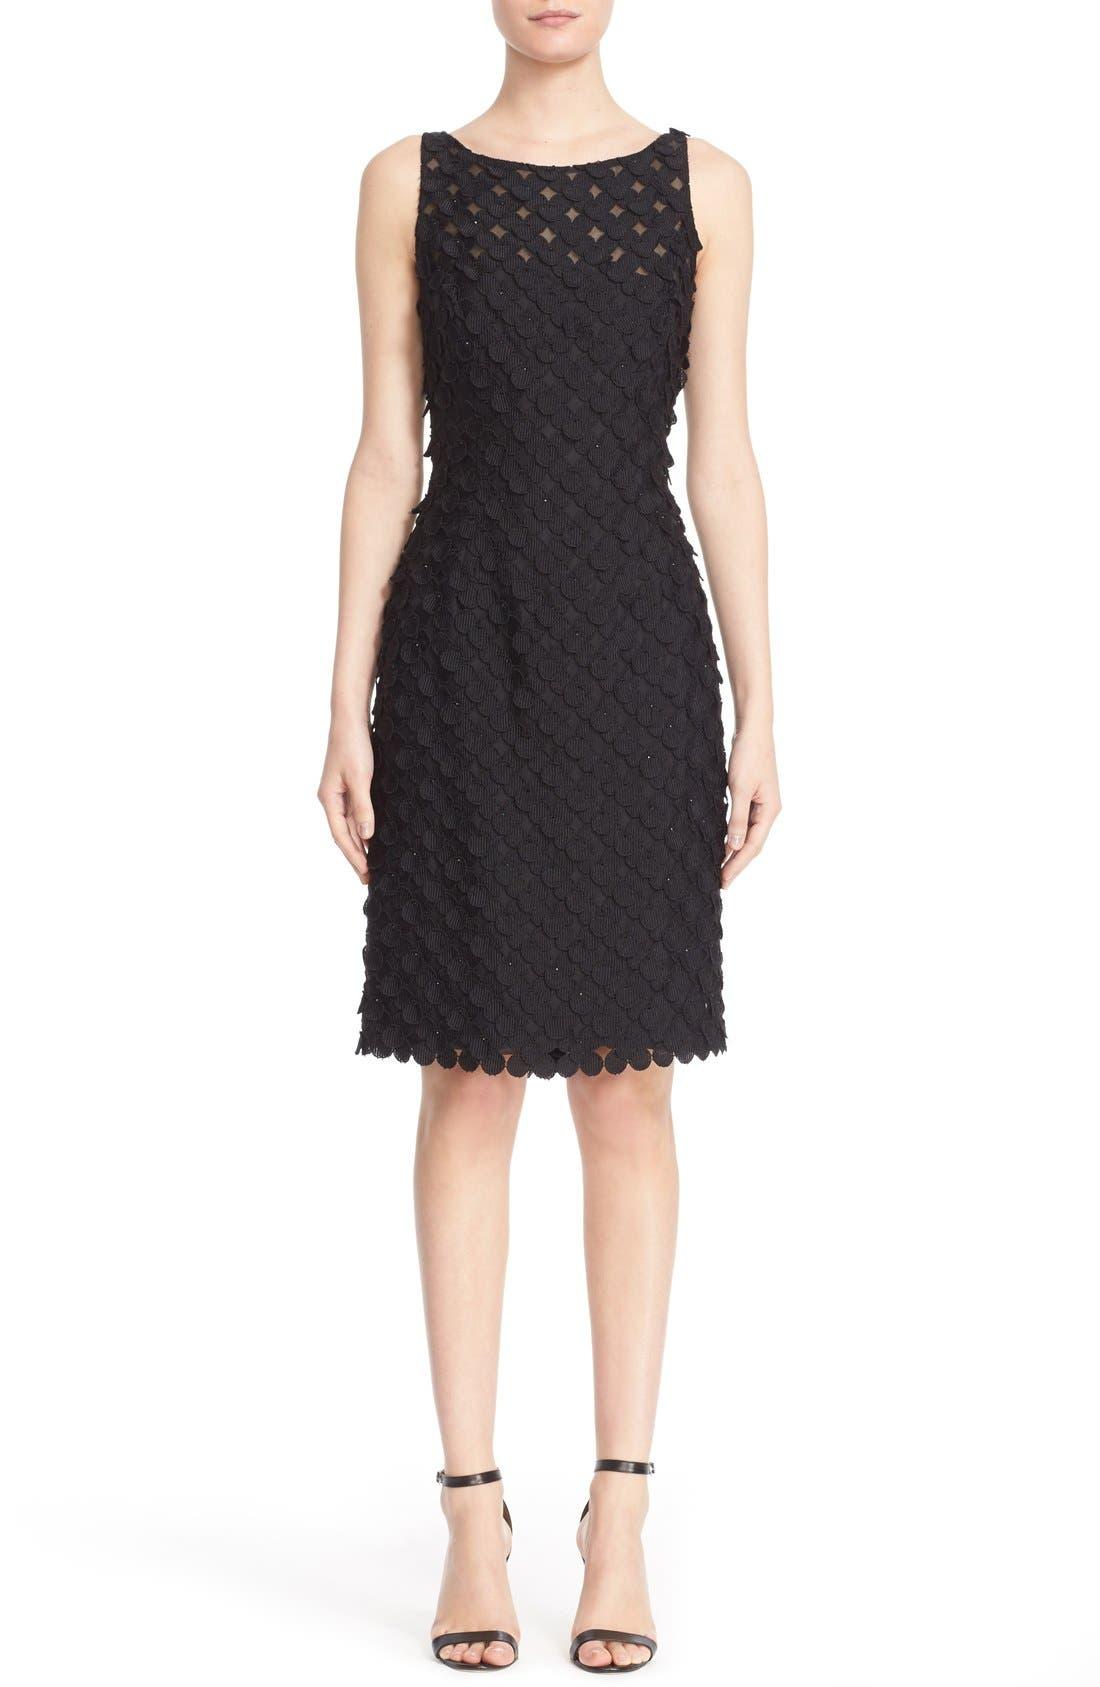 Carmen Marc Valvo Couture Circle Appliqué Sleeveless Sheath Dress